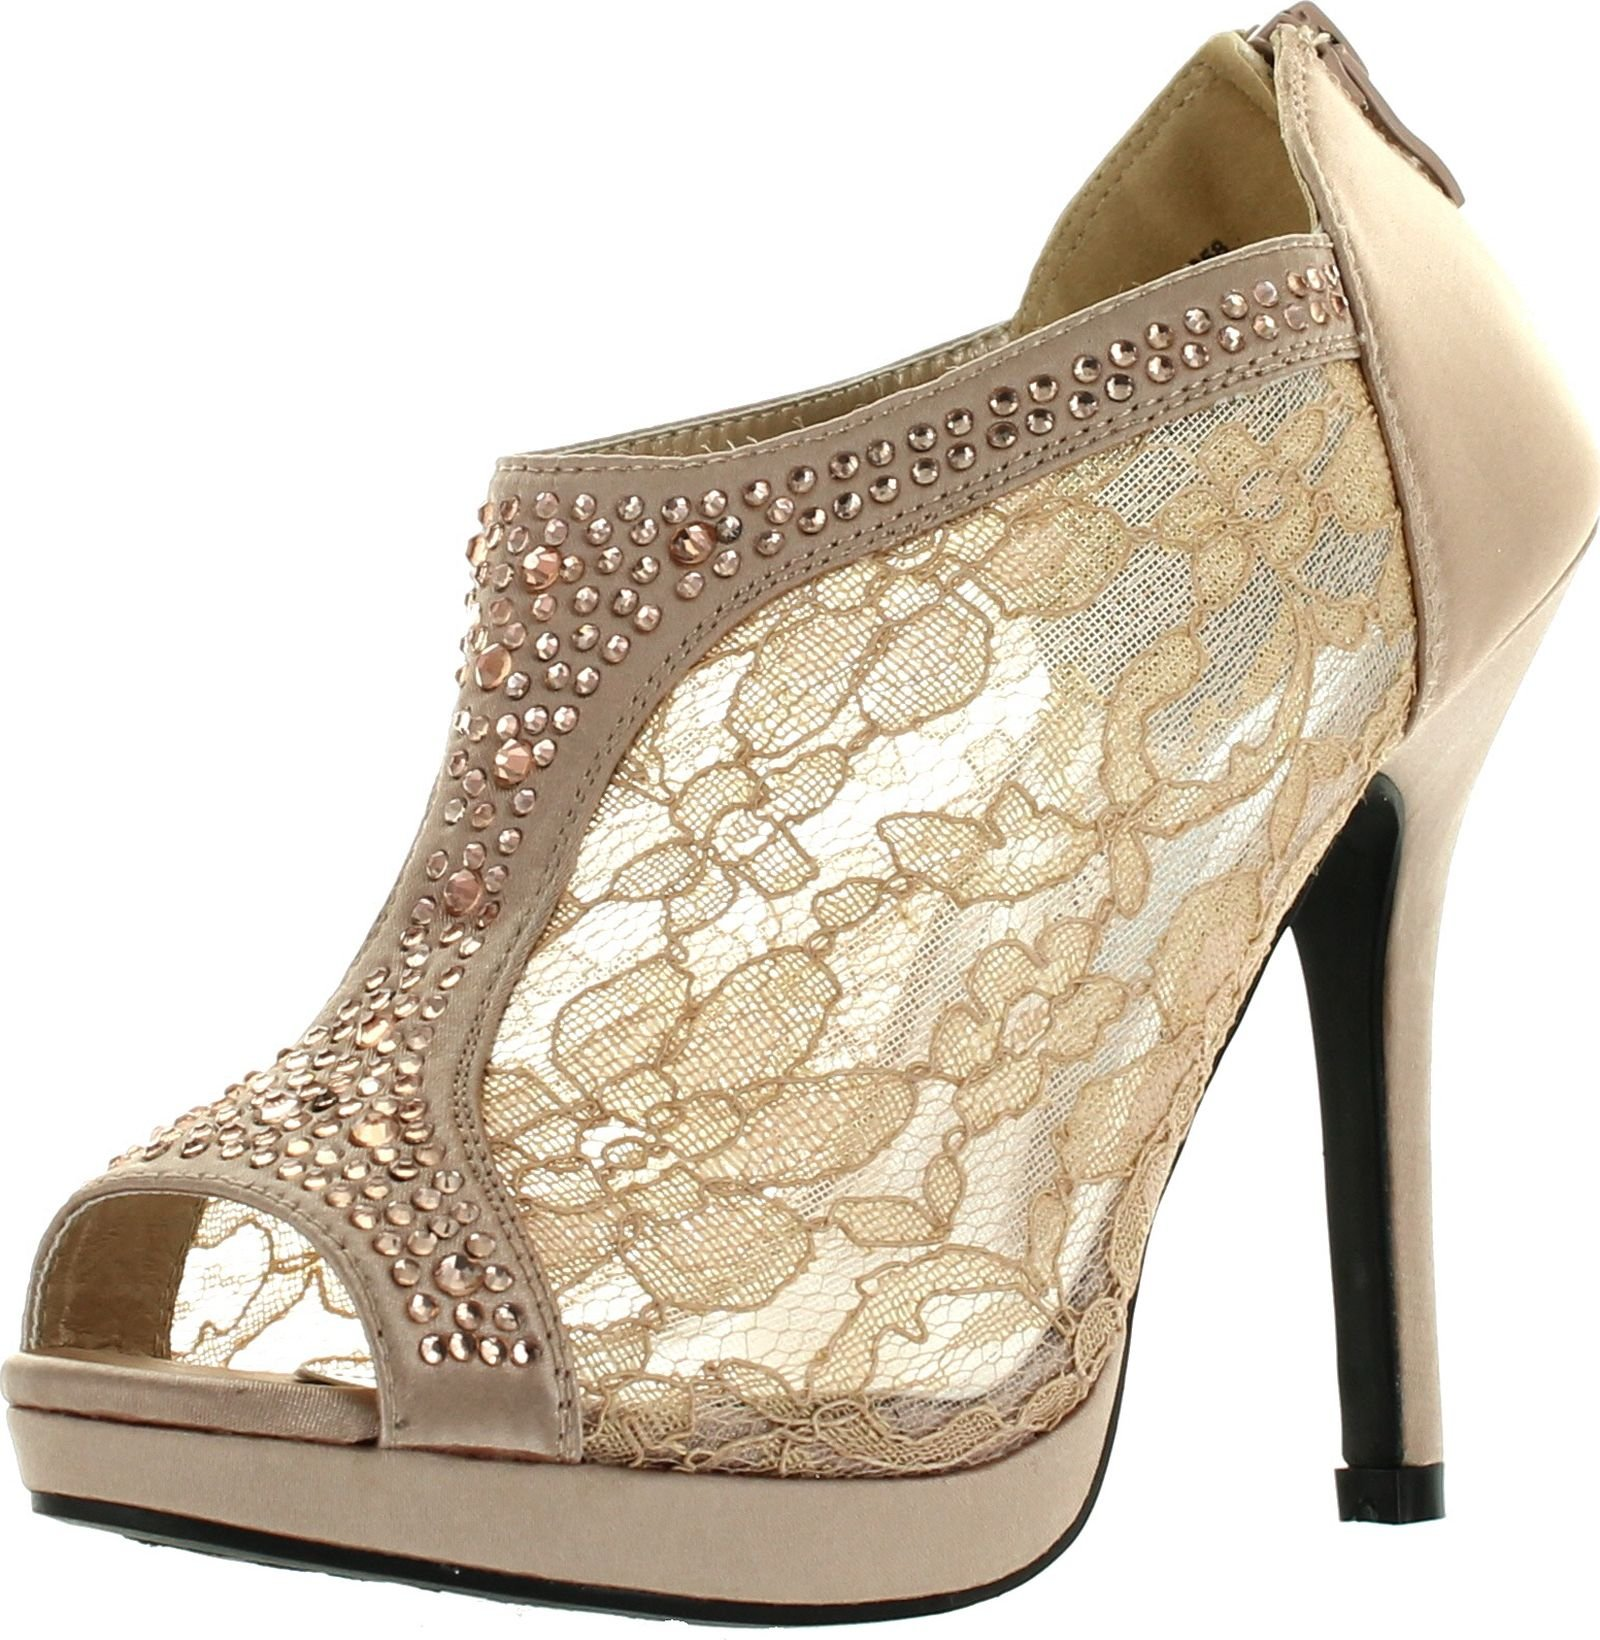 De Blossom Yael-9 Womens Wedding Bridal High Heel Platform Cystal Lace Ankle Bootie Shoes,Nude,10